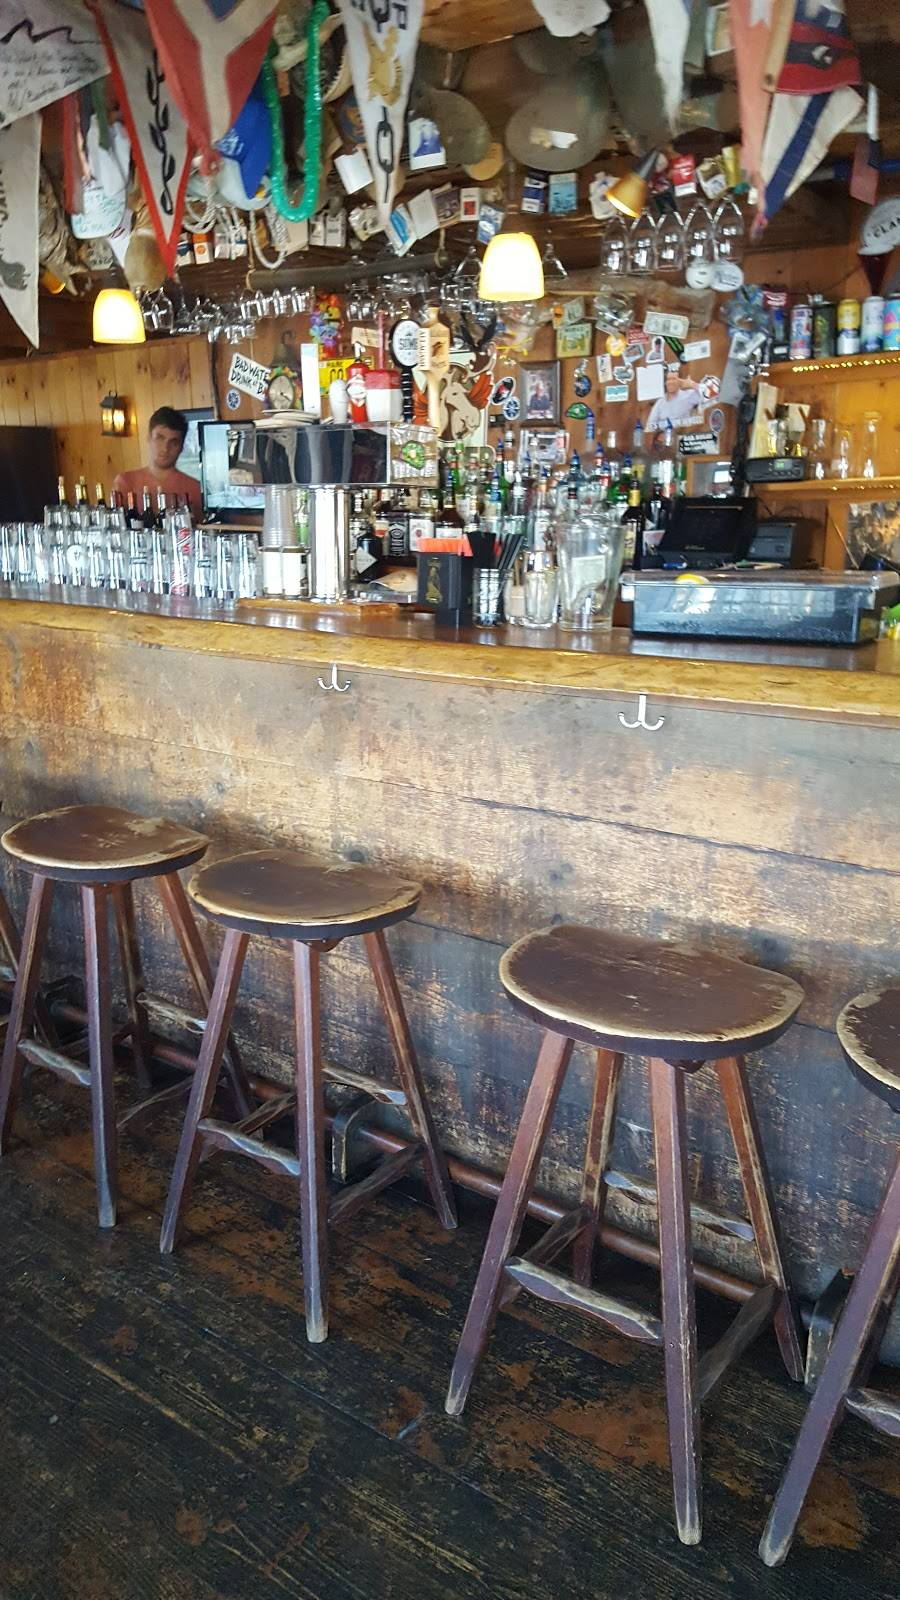 Coveside | restaurant | 105 Coveside Rd, South Bristol, ME 04568, USA | 2076448282 OR +1 207-644-8282